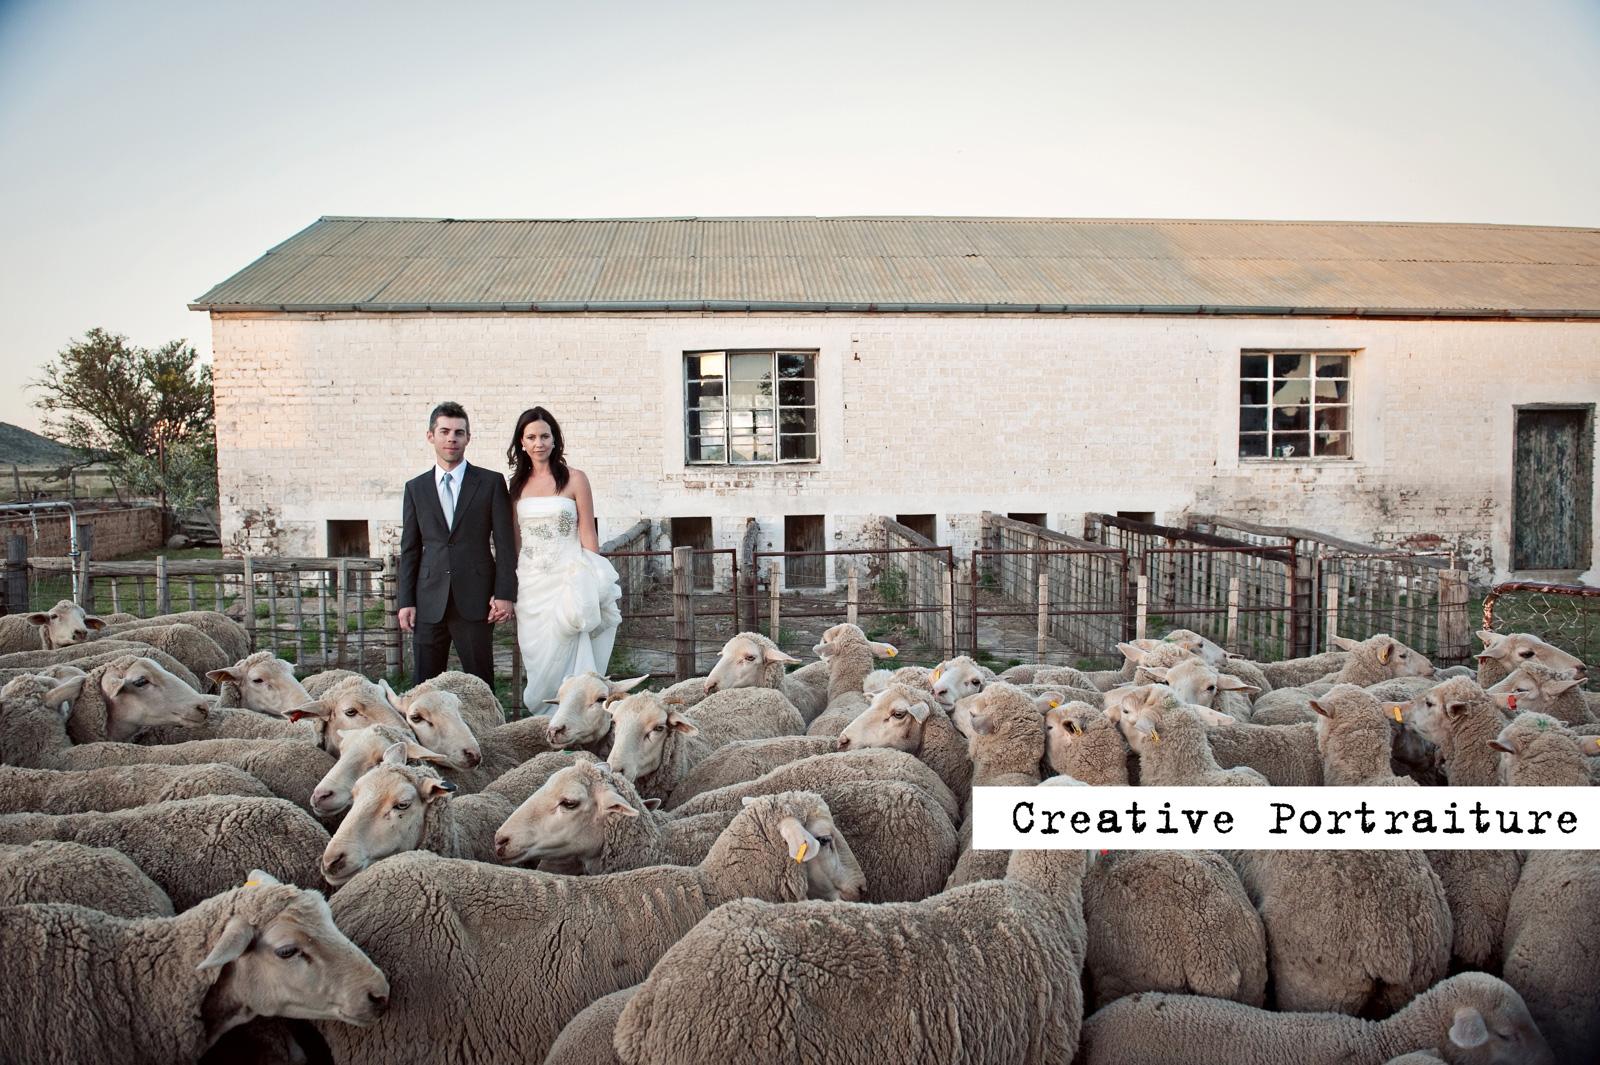 Wedding couple with sheep in the karoo